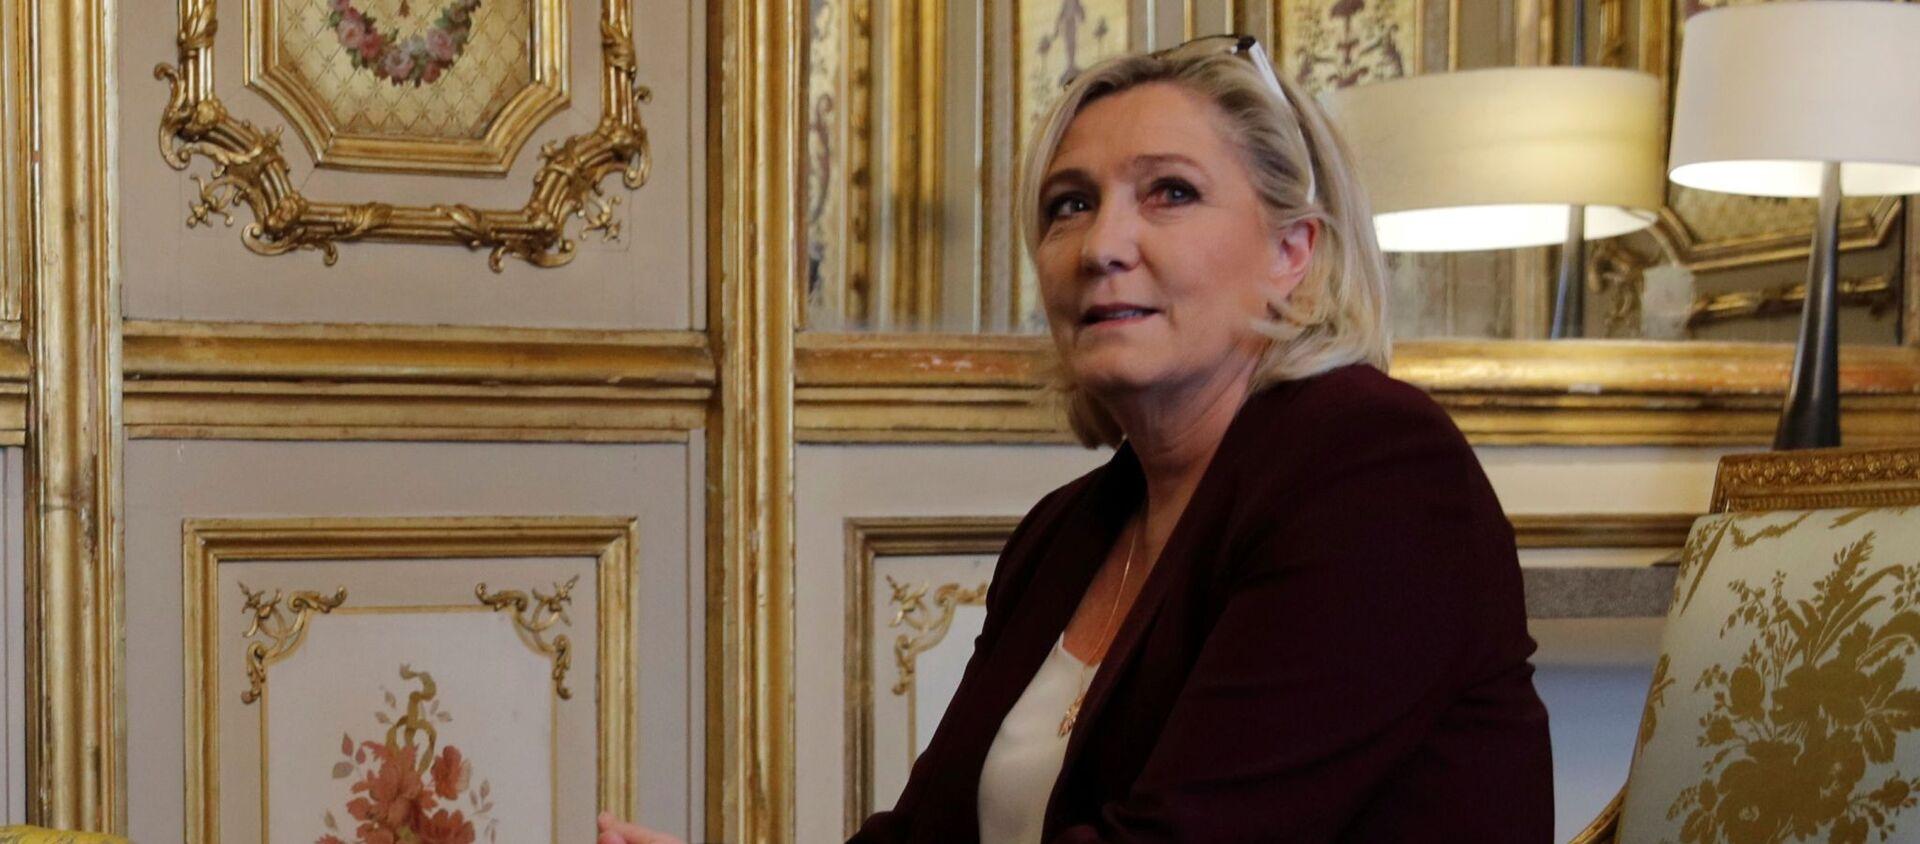 Marine Le Pen at the Elysee Palace in Paris, France, February 6, 2019 - Sputnik International, 1920, 04.07.2021